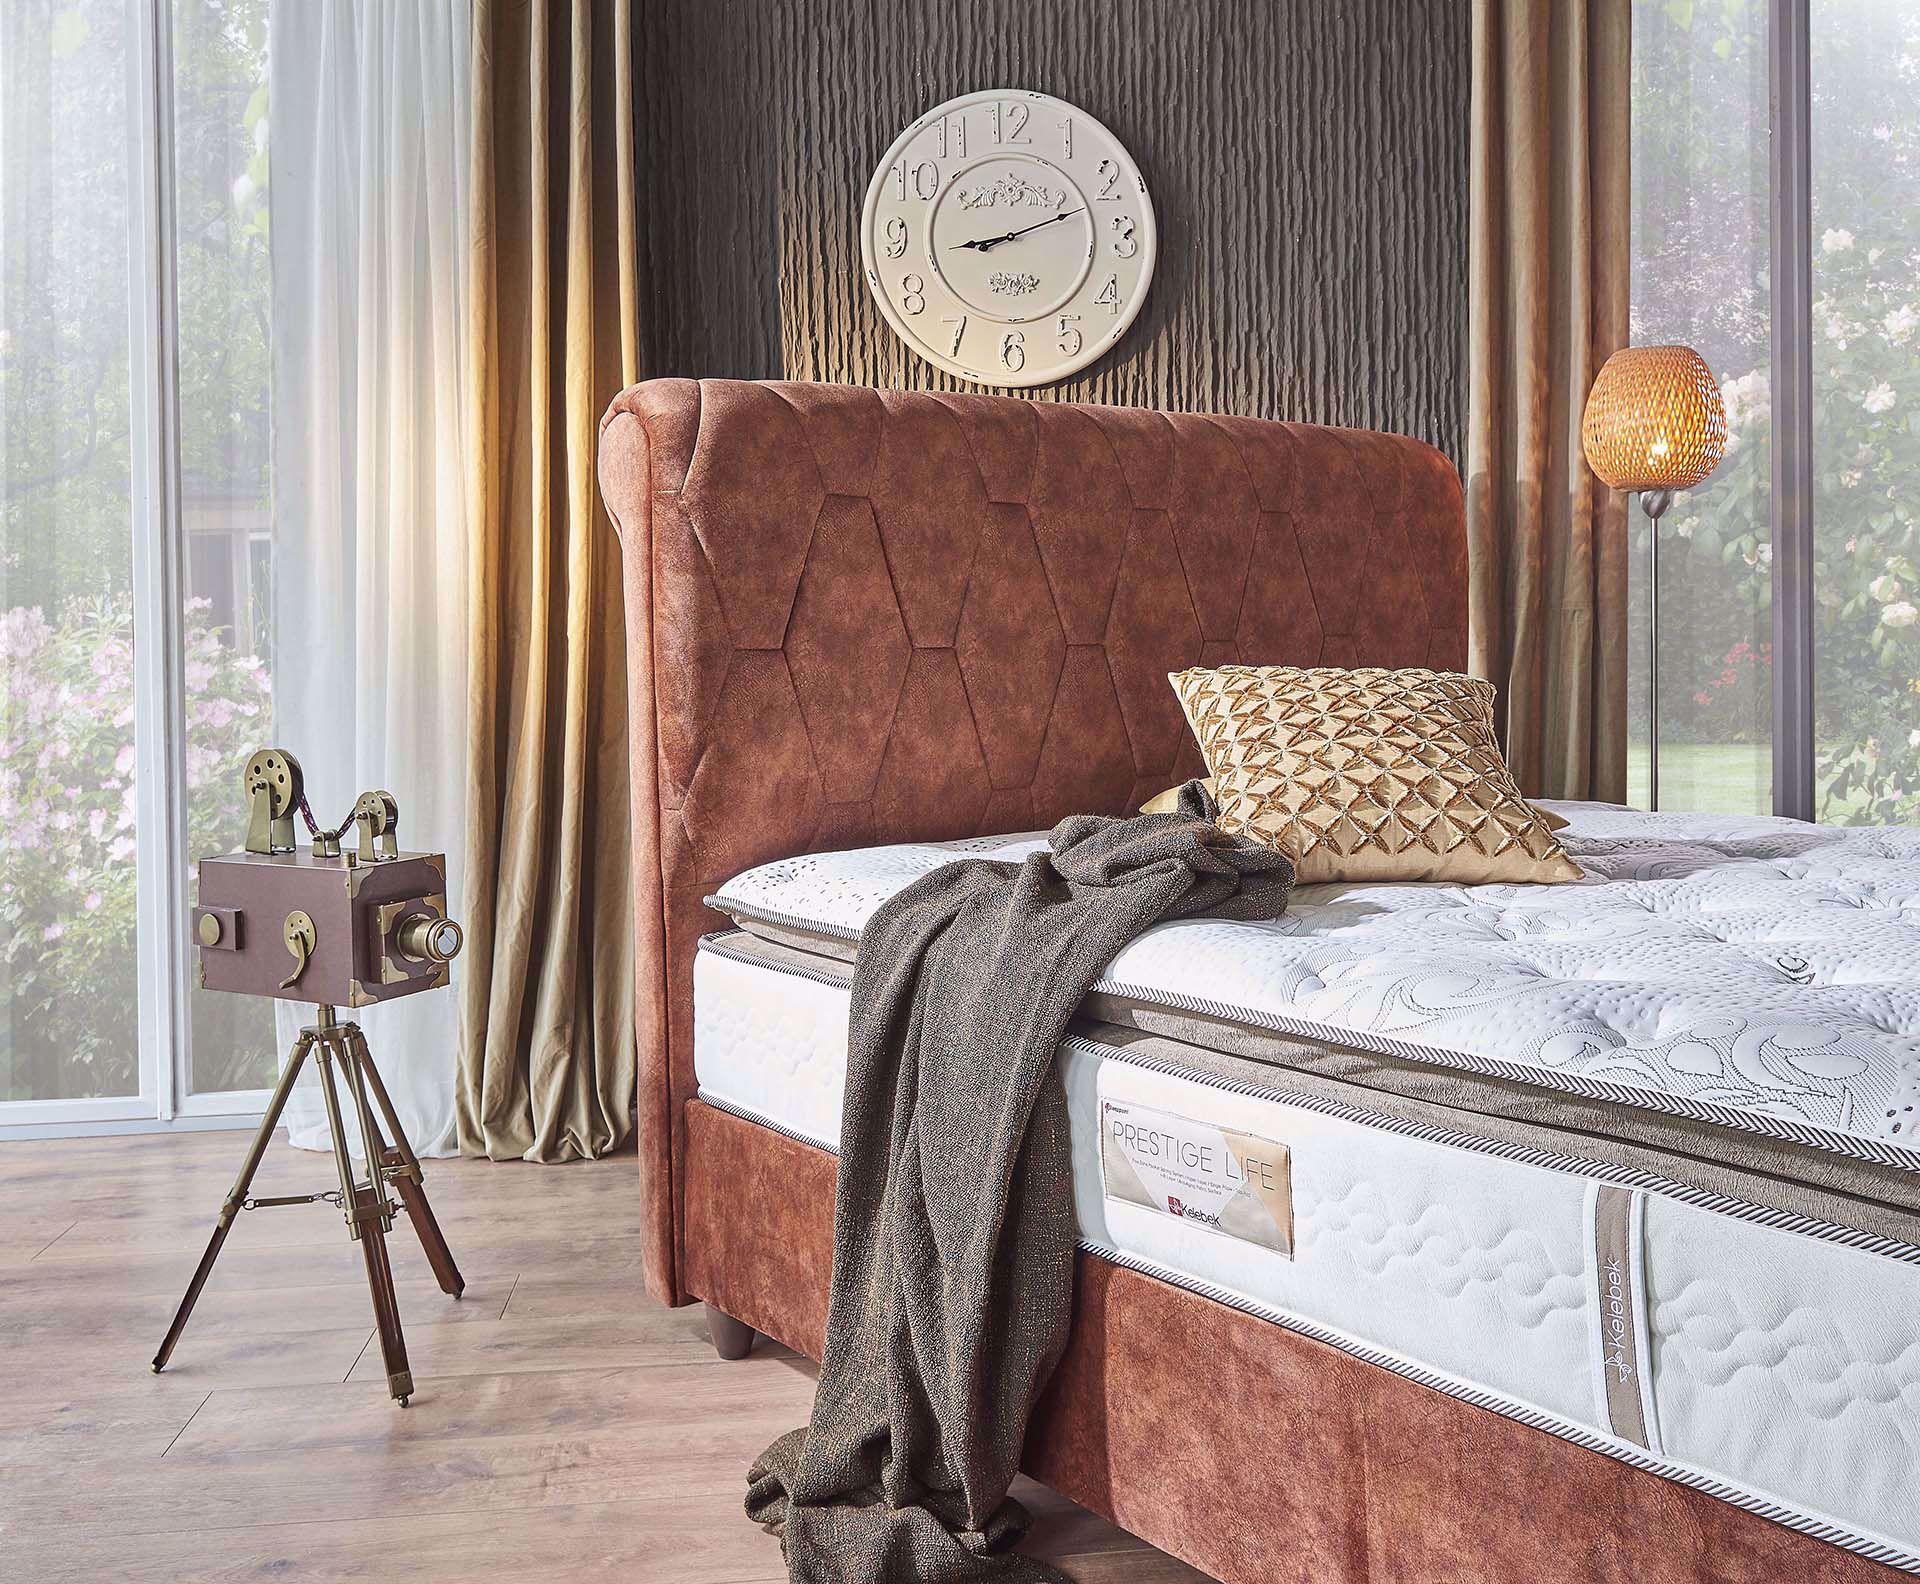 Comfort Plus Prestige Life Yatak 160*200 cm